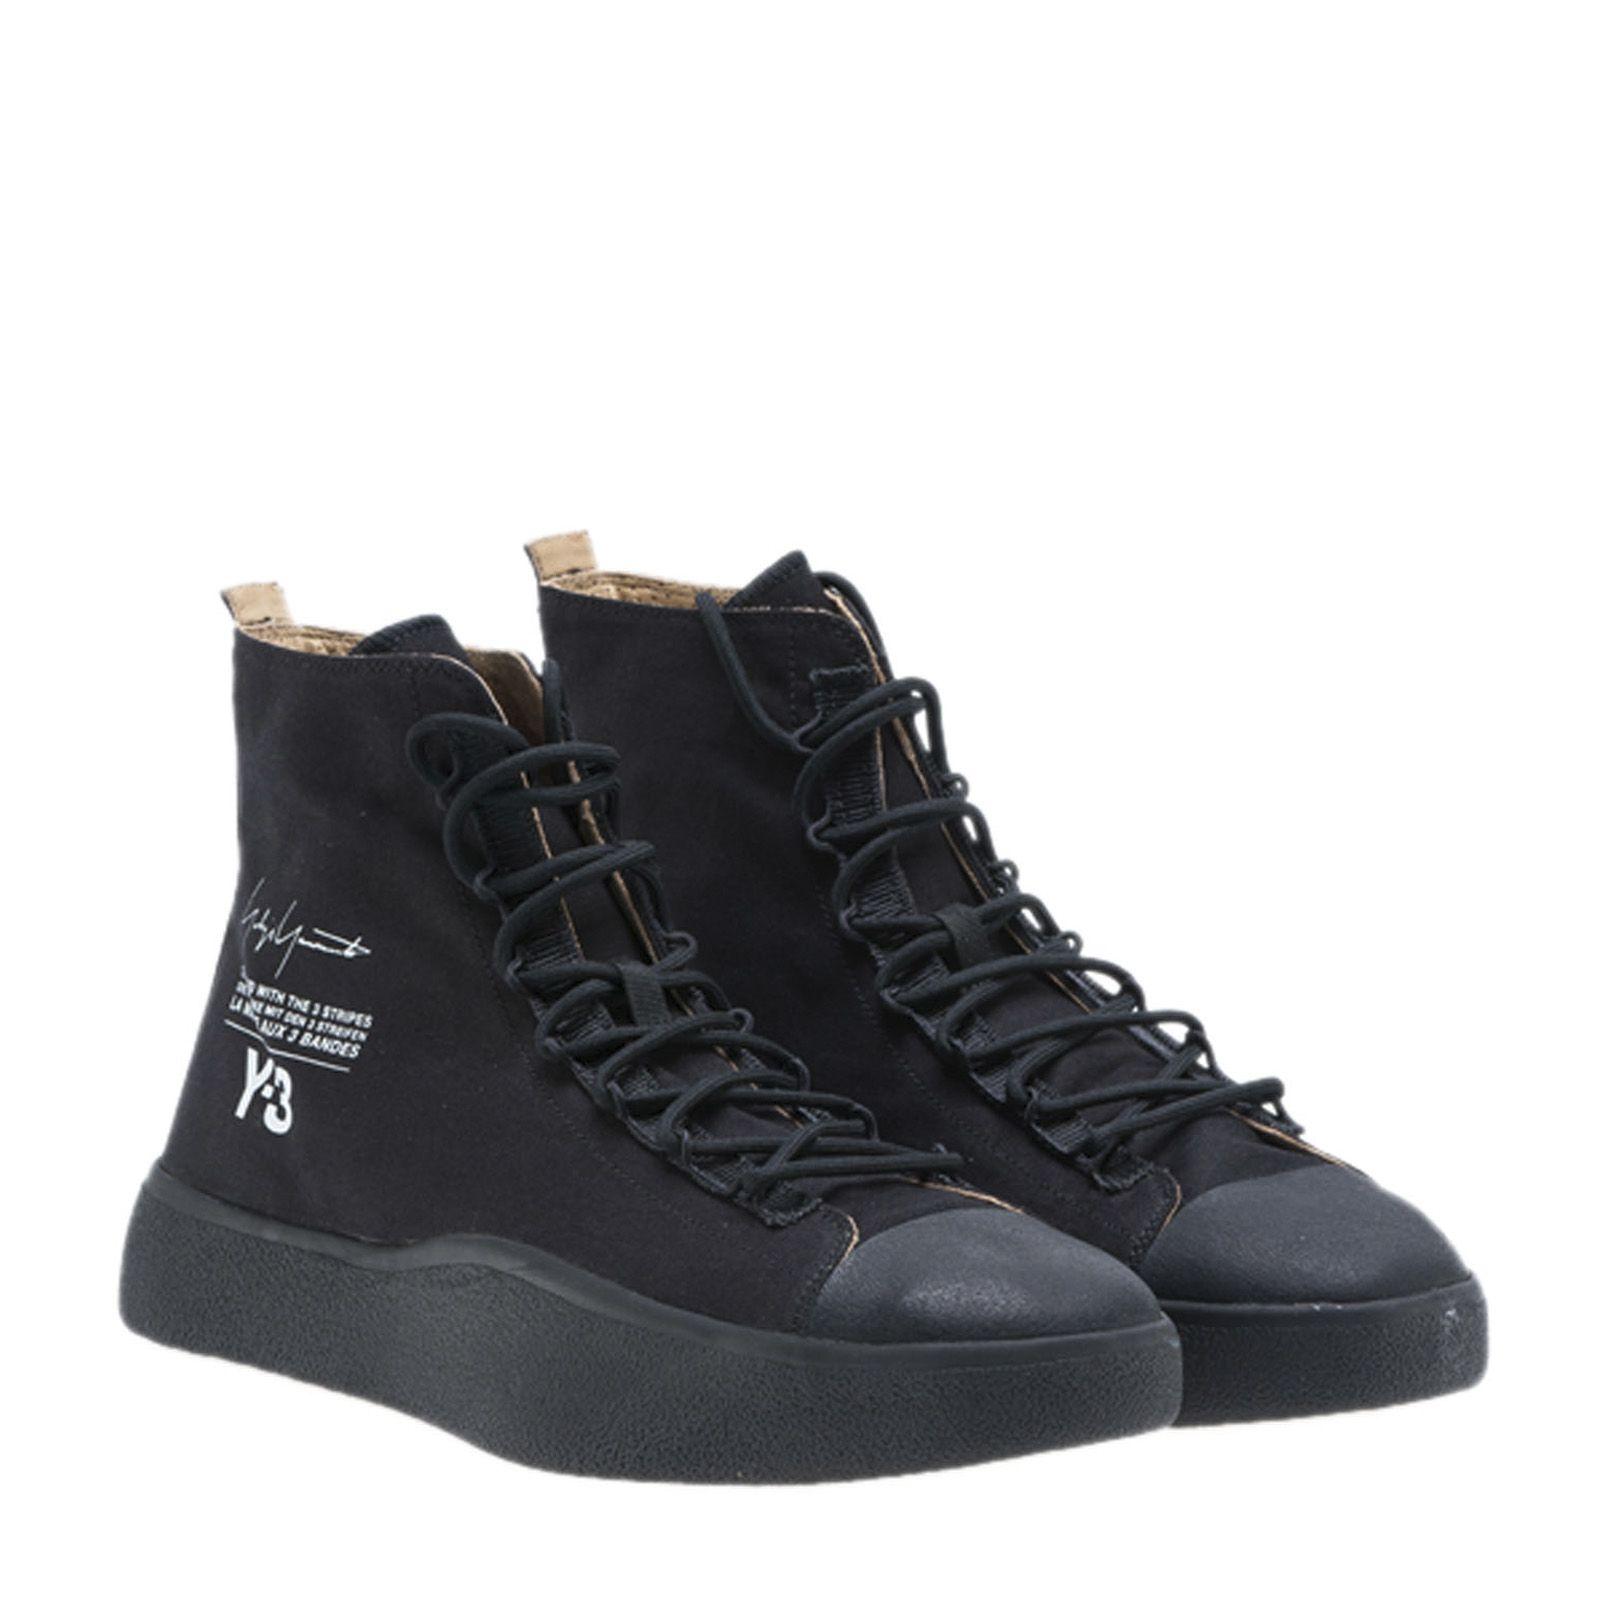 Adidas Y-3 Bashyo Sneakers